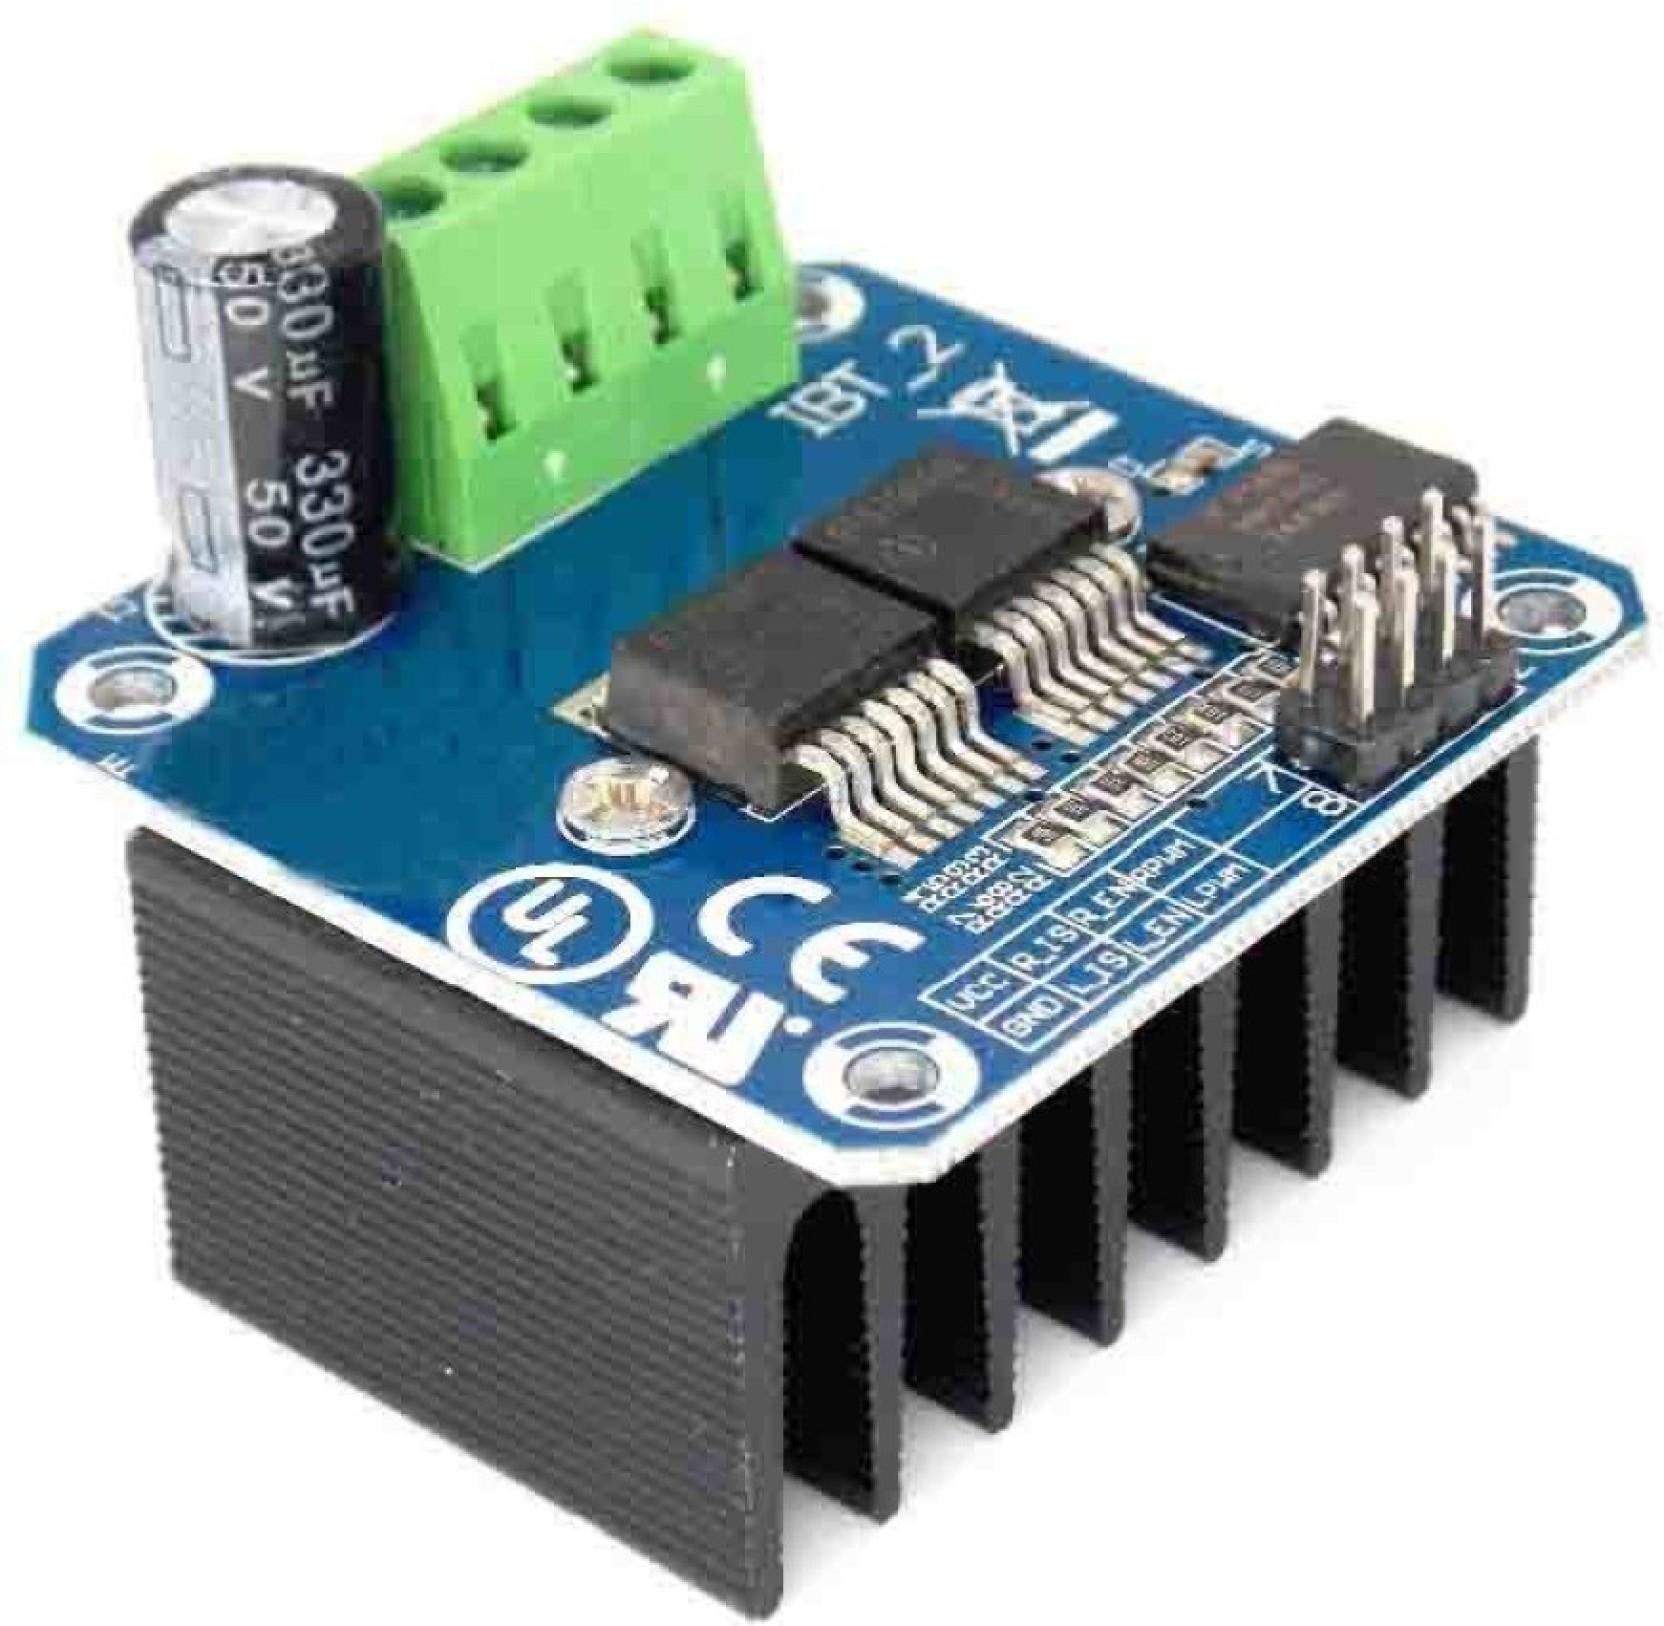 Kitsguru Double Bts7960b Dc 43a Stepper Motor Driver H Bridge Pwm Amplifier It Is Such A Complete Hbridge For Arduino Smart Car Share